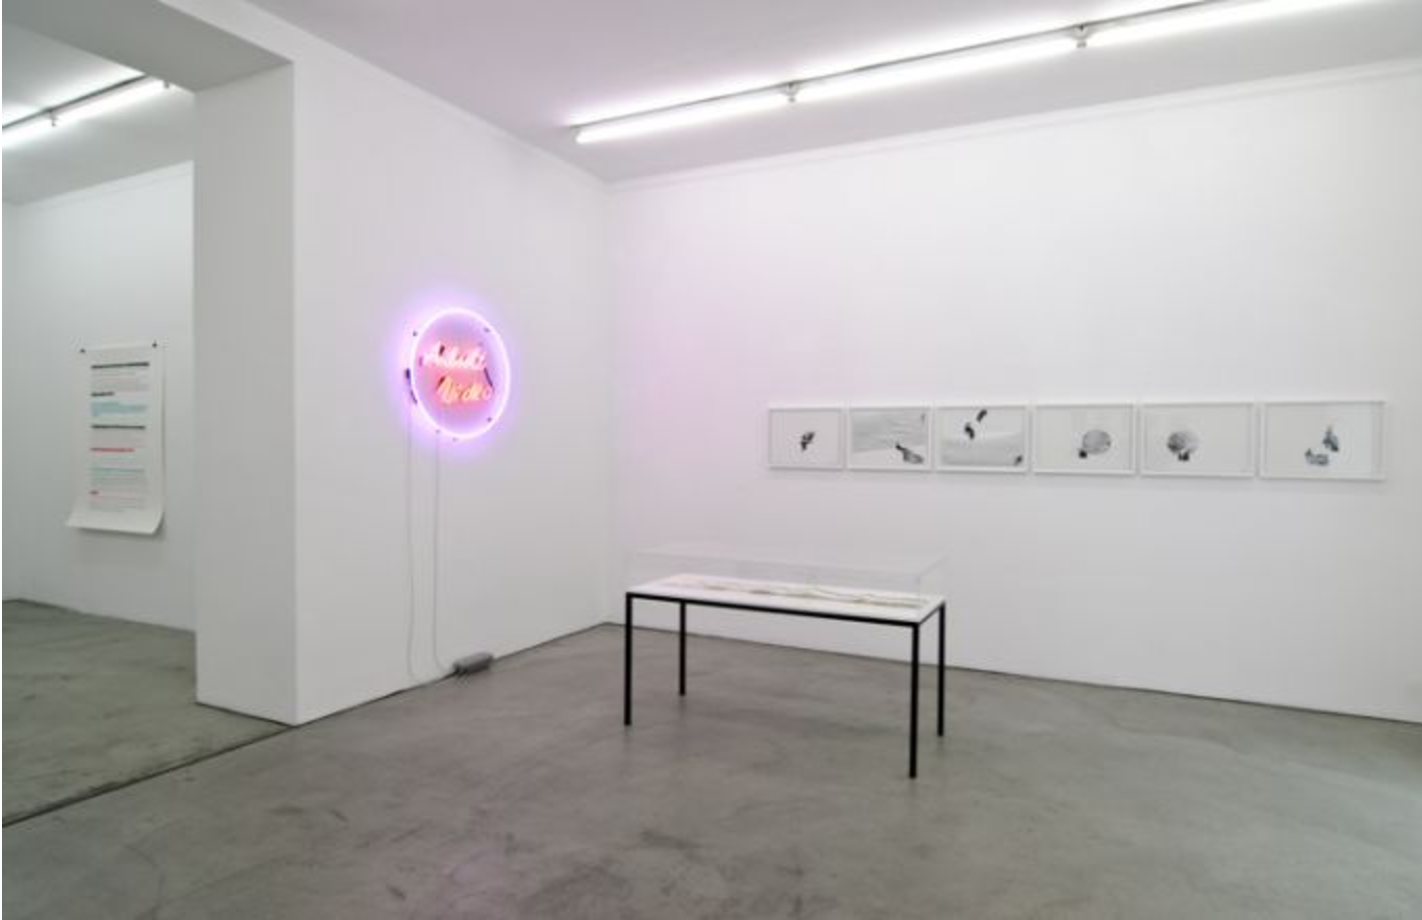 Exhibition View, Gabriele Senn Galerie, You're scripted, curated by_Marko Lulic, 2010, Photo: Gabriele Senn Galerie